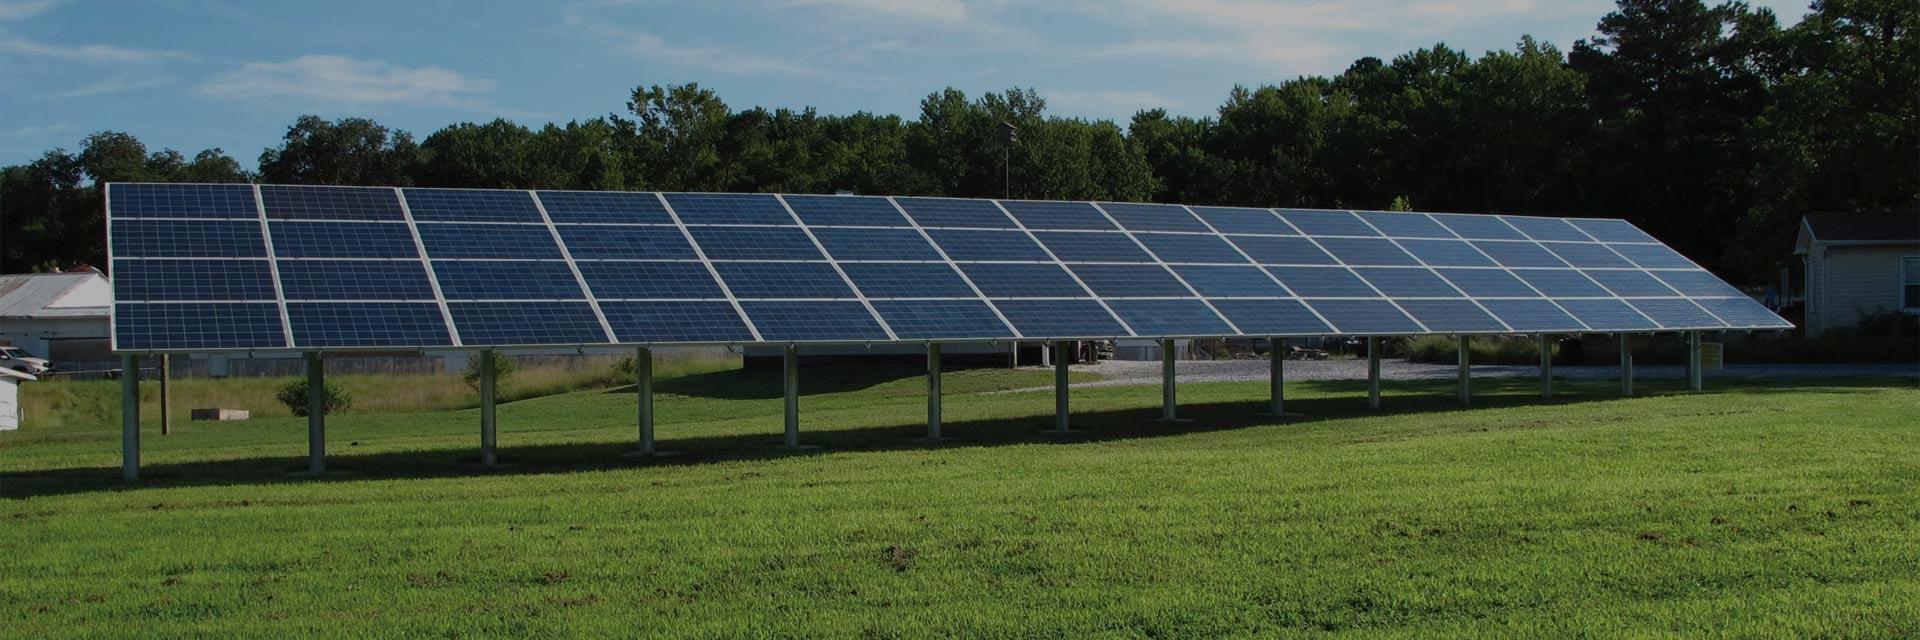 1920x640-solar-farm-2-min